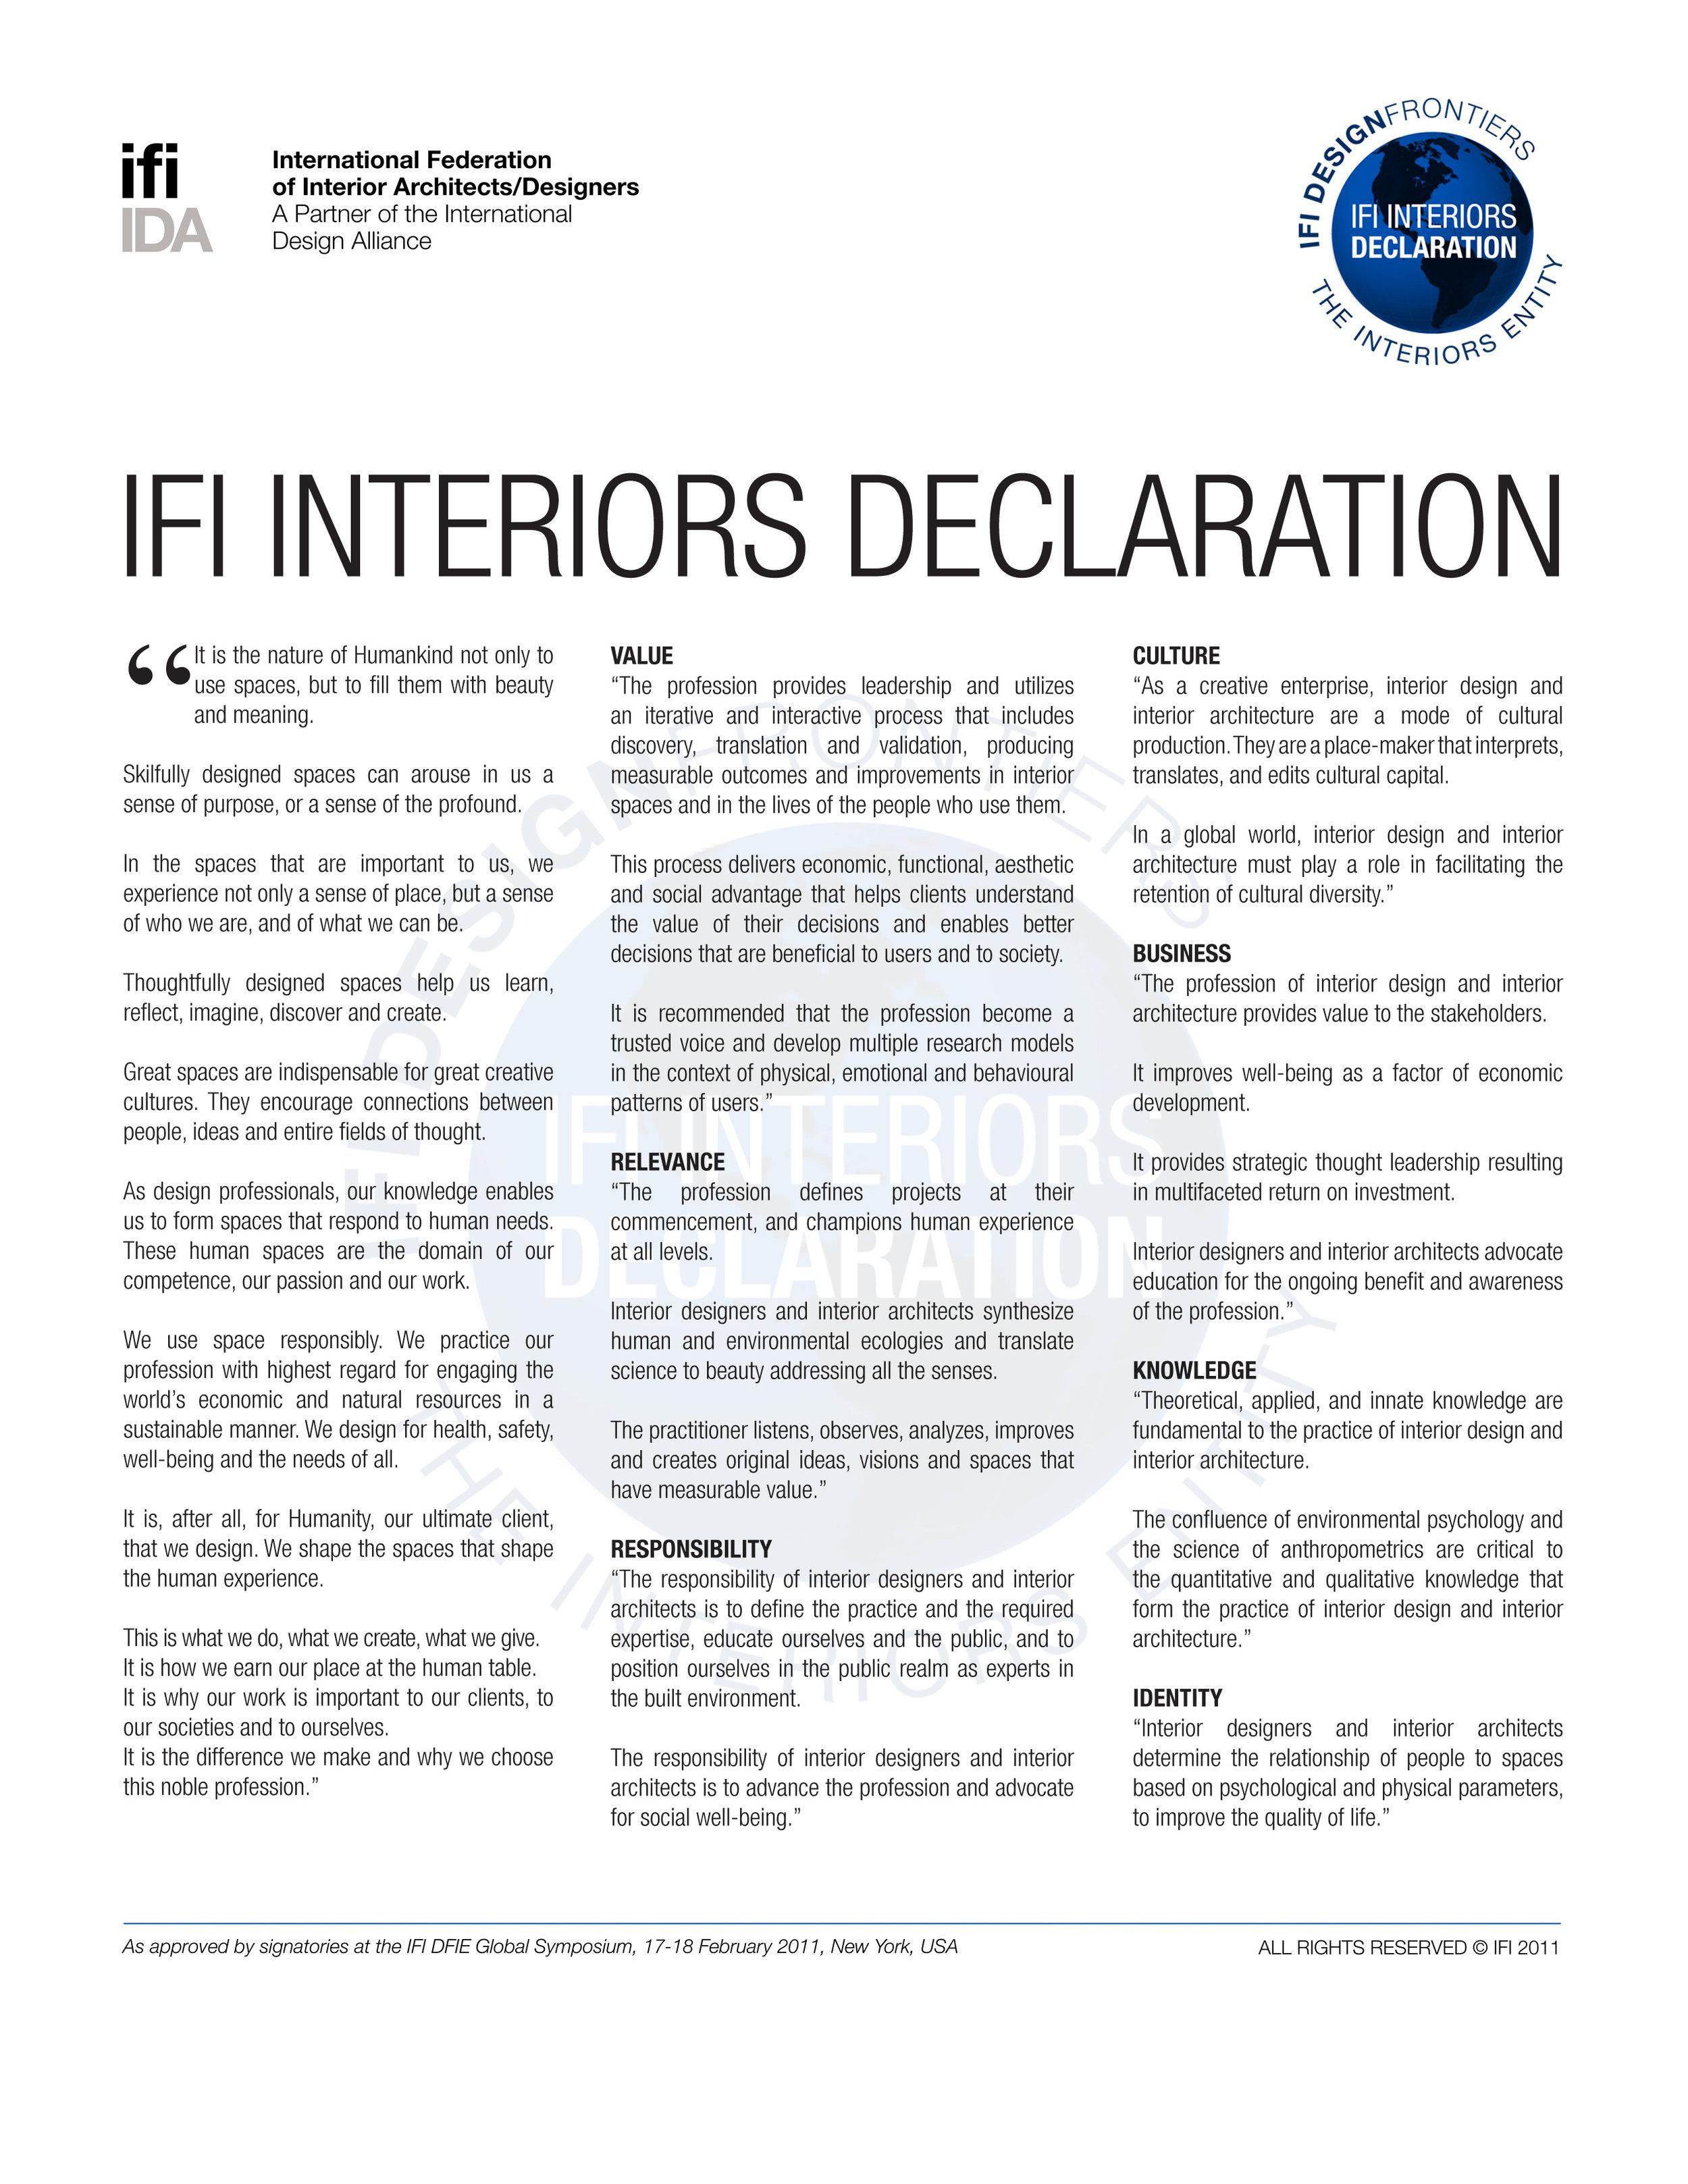 IFI Interiors Declaration_041311.jpg